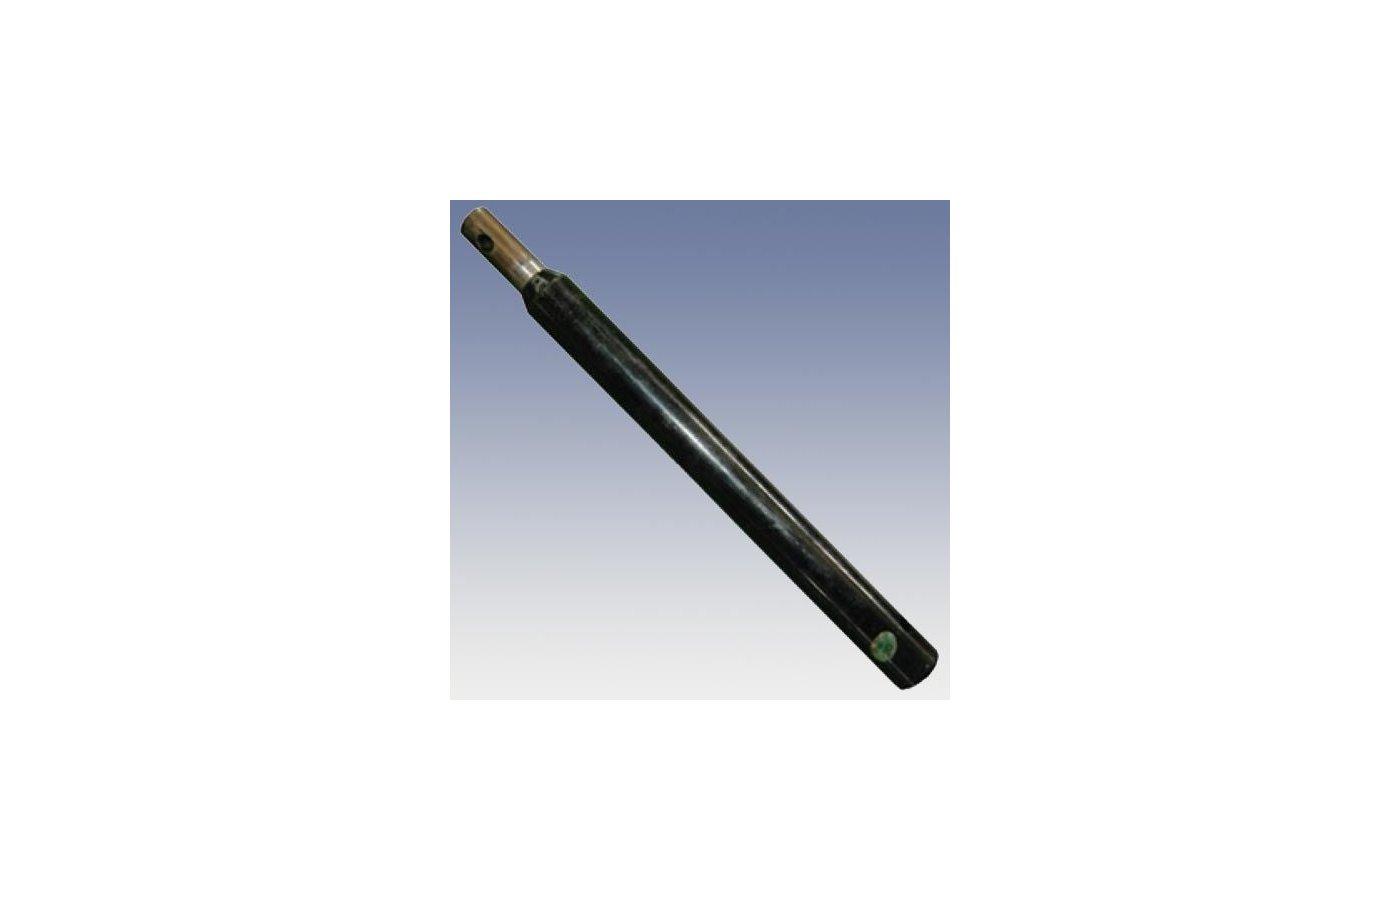 Мотоблок КРАТОН GHD-1450 Удлинитель к буру 300 мм